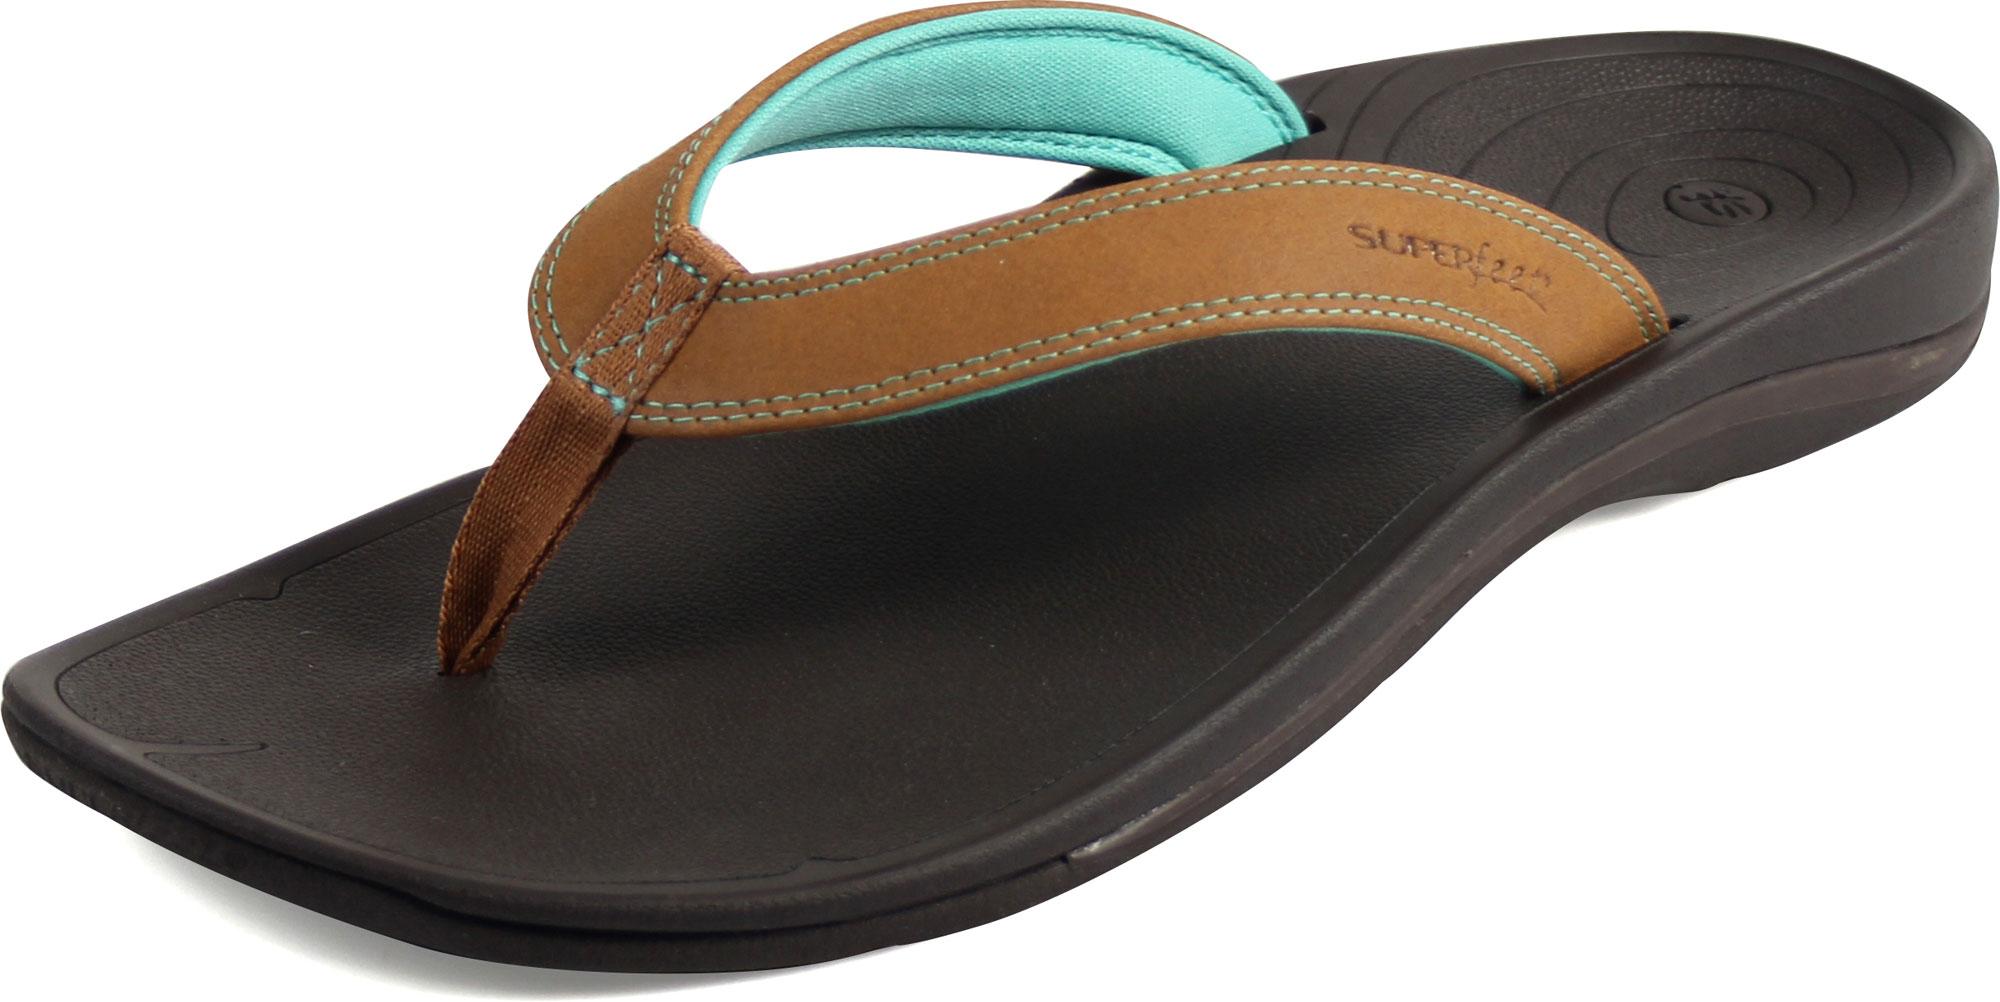 superfeet womens outside sandals